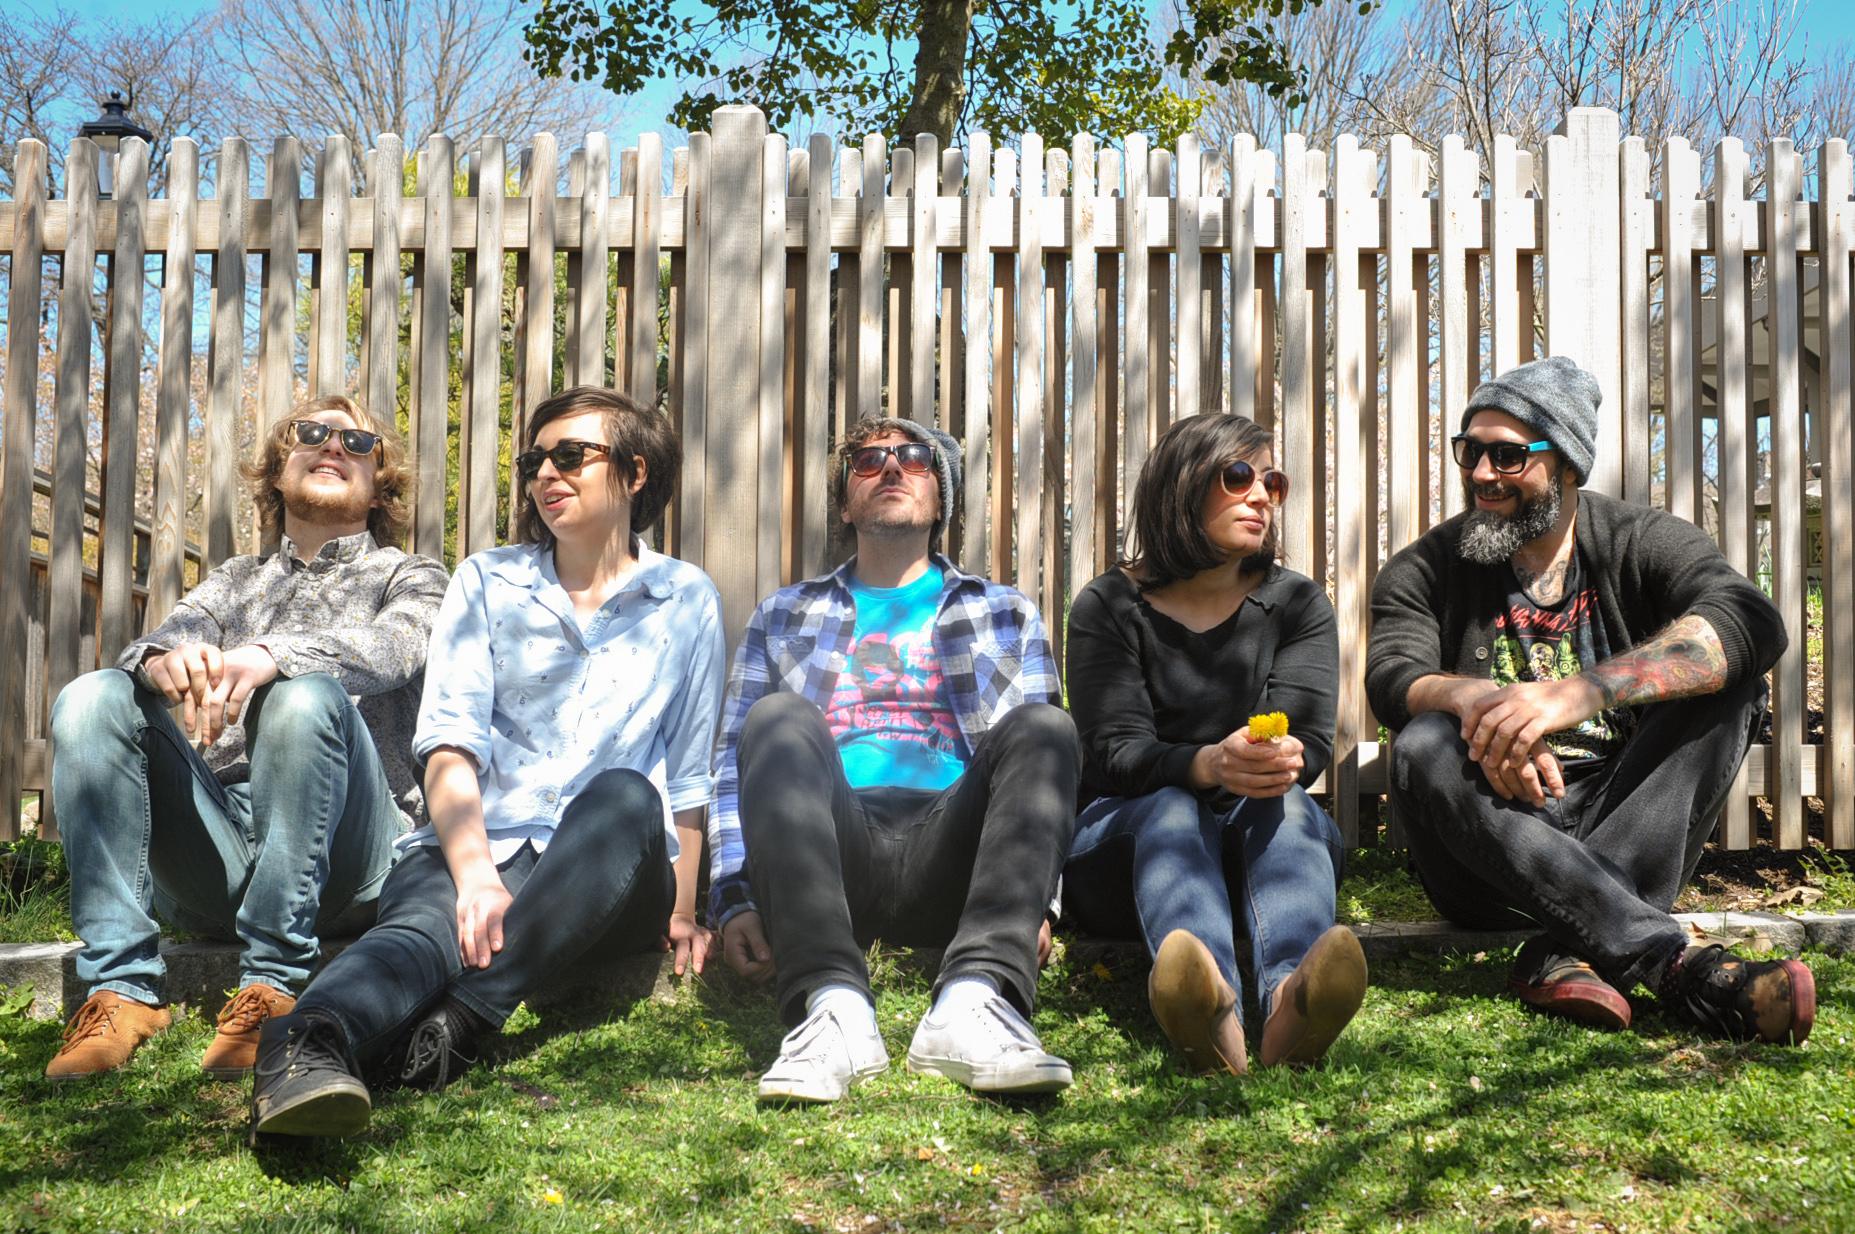 Bethlehem-based indie rock band VoirVoir will perform June 10 at Musikfest Cafe in Bethlehem.  (Courtesy Photo)